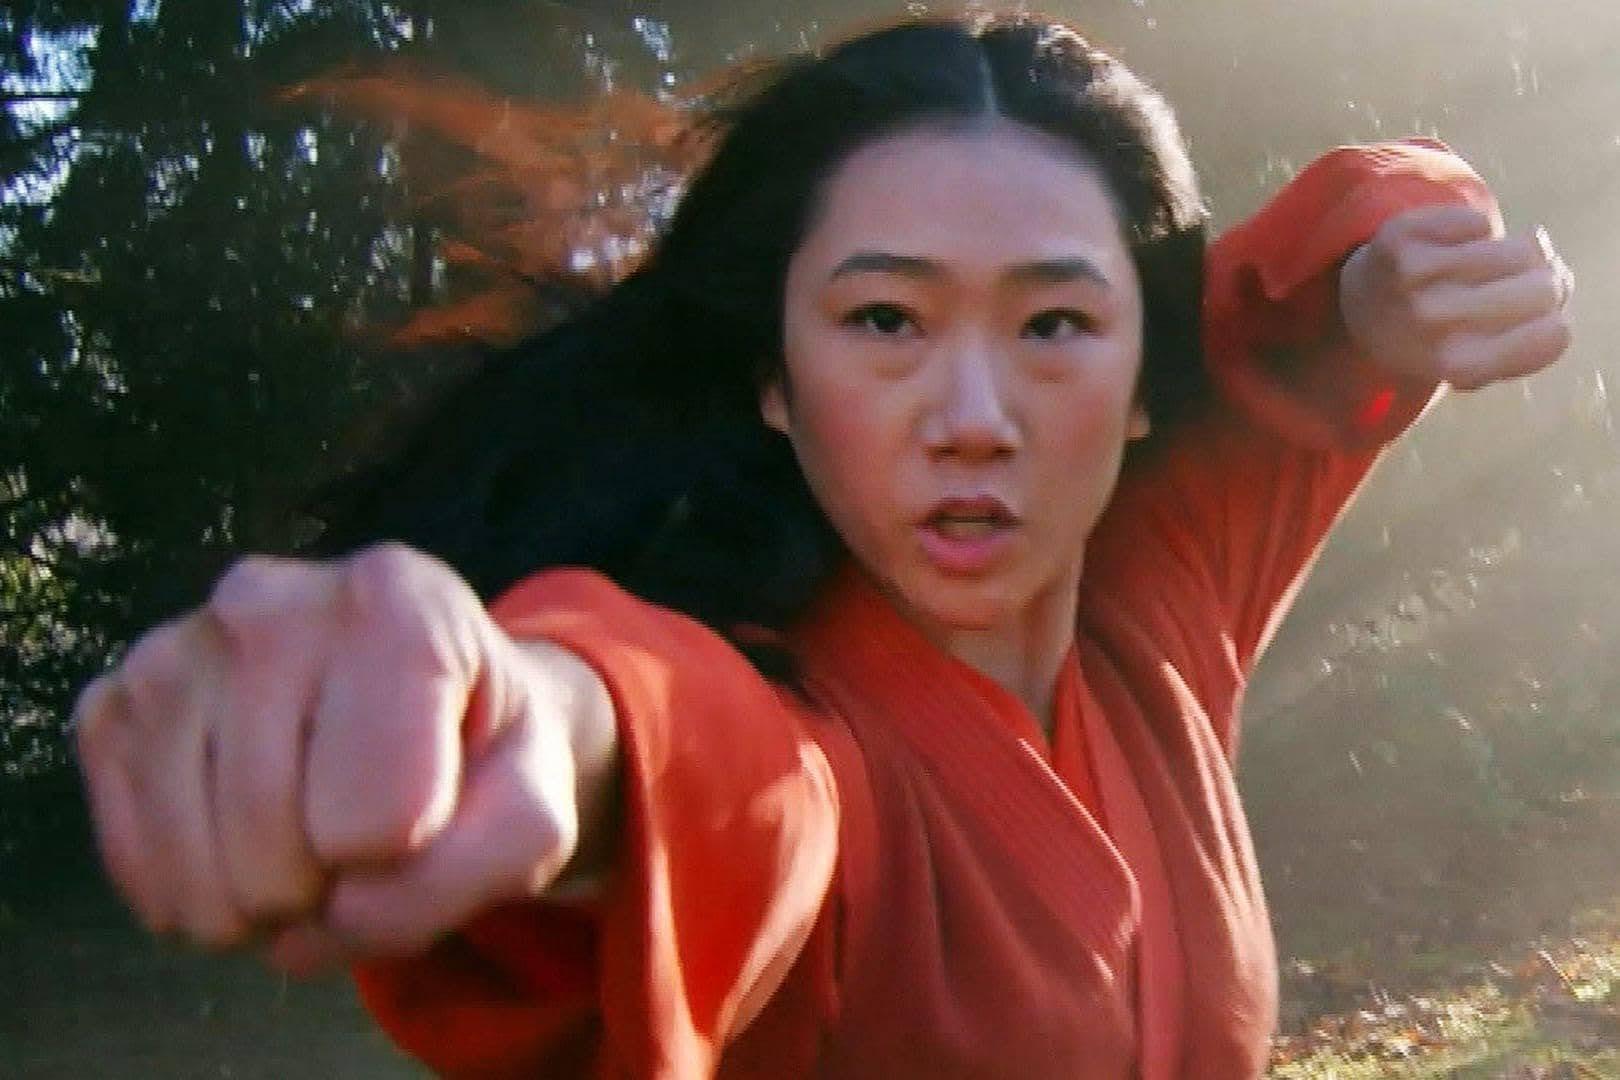 Kung Fu : 70年代の人気テレビシリーズ「燃えよ!カンフー」を現代的に復活し、戦うヒロインの活躍を描くマーシャル・アーツ・ドラマの新しい「カンフー」の予告編を初公開 ! !